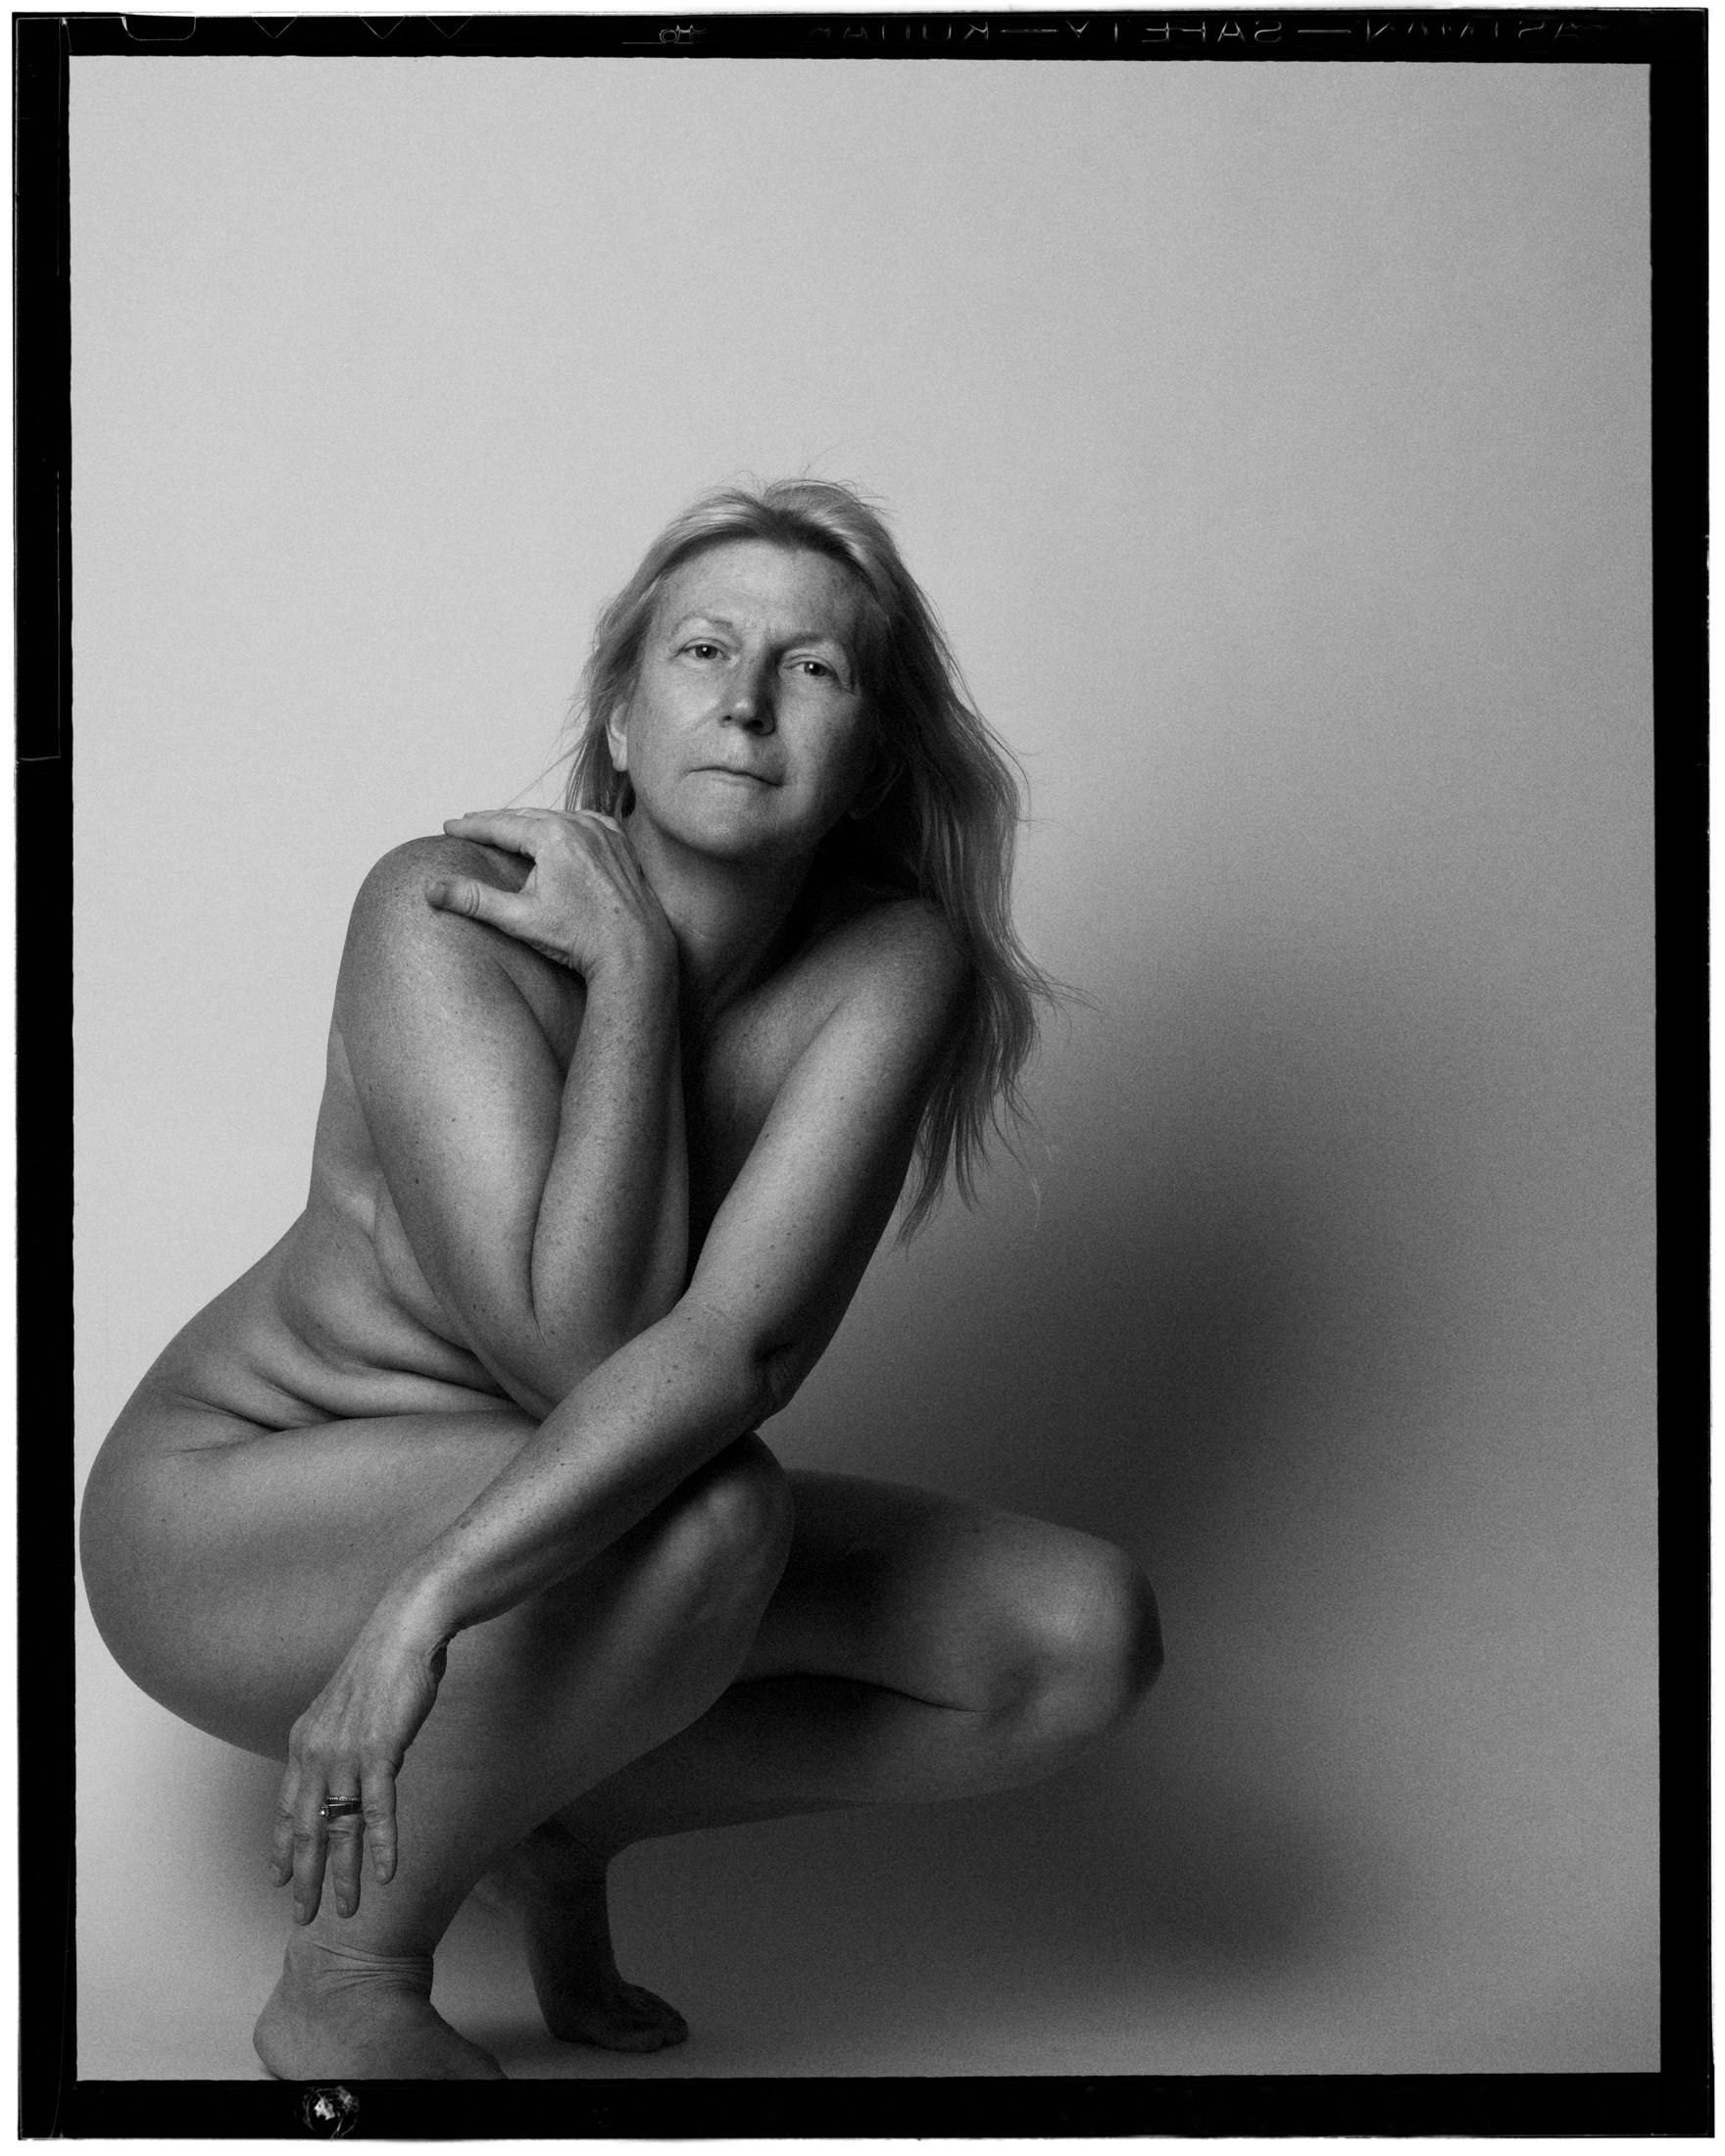 wildwomanproject_karamariestudios3.jpg